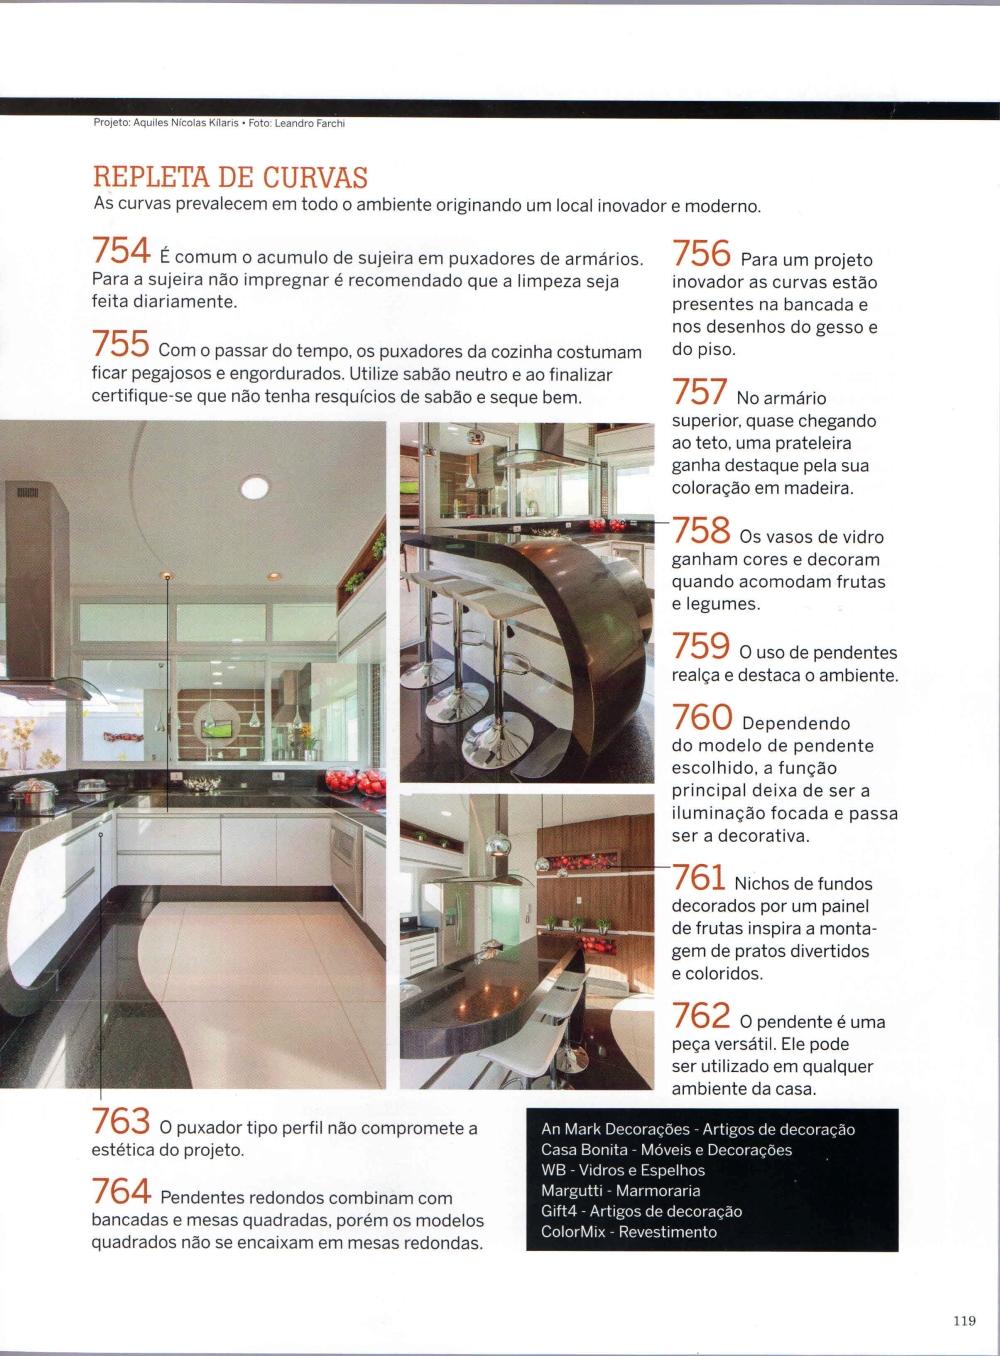 Arquiteto Aquiles Nicolas Kilaris Revista Guia 1001 ideias (14)